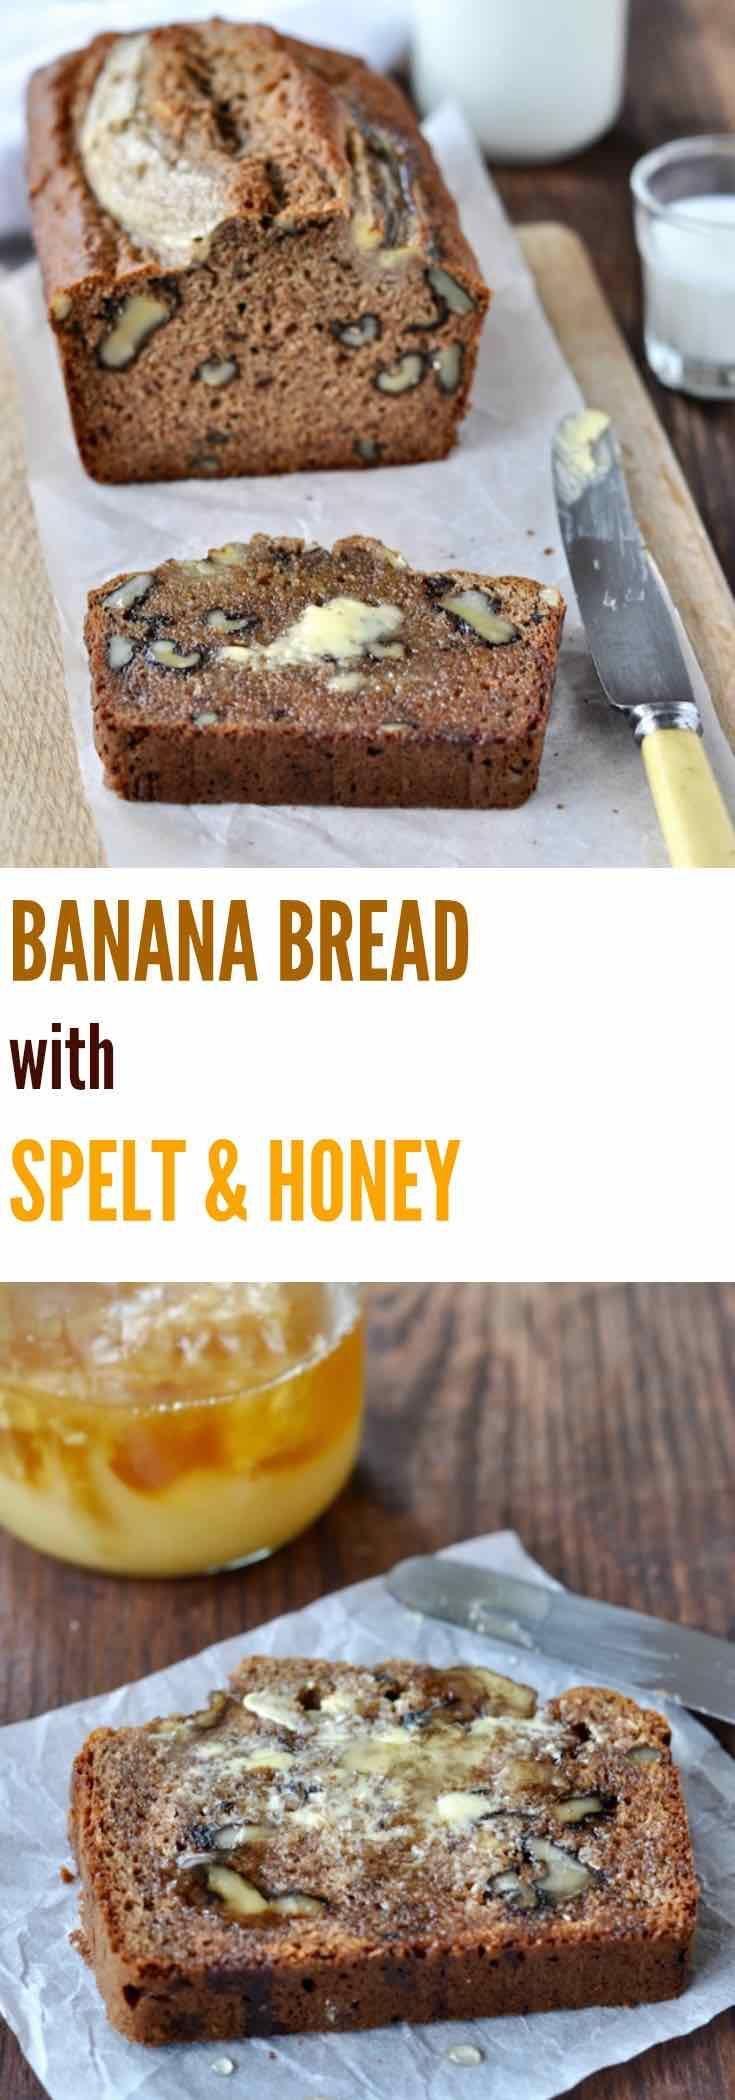 Spelt banana and walnut bread recipe banana bread bananas and honey spelt banana and walnut bread real food recipesbread forumfinder Image collections